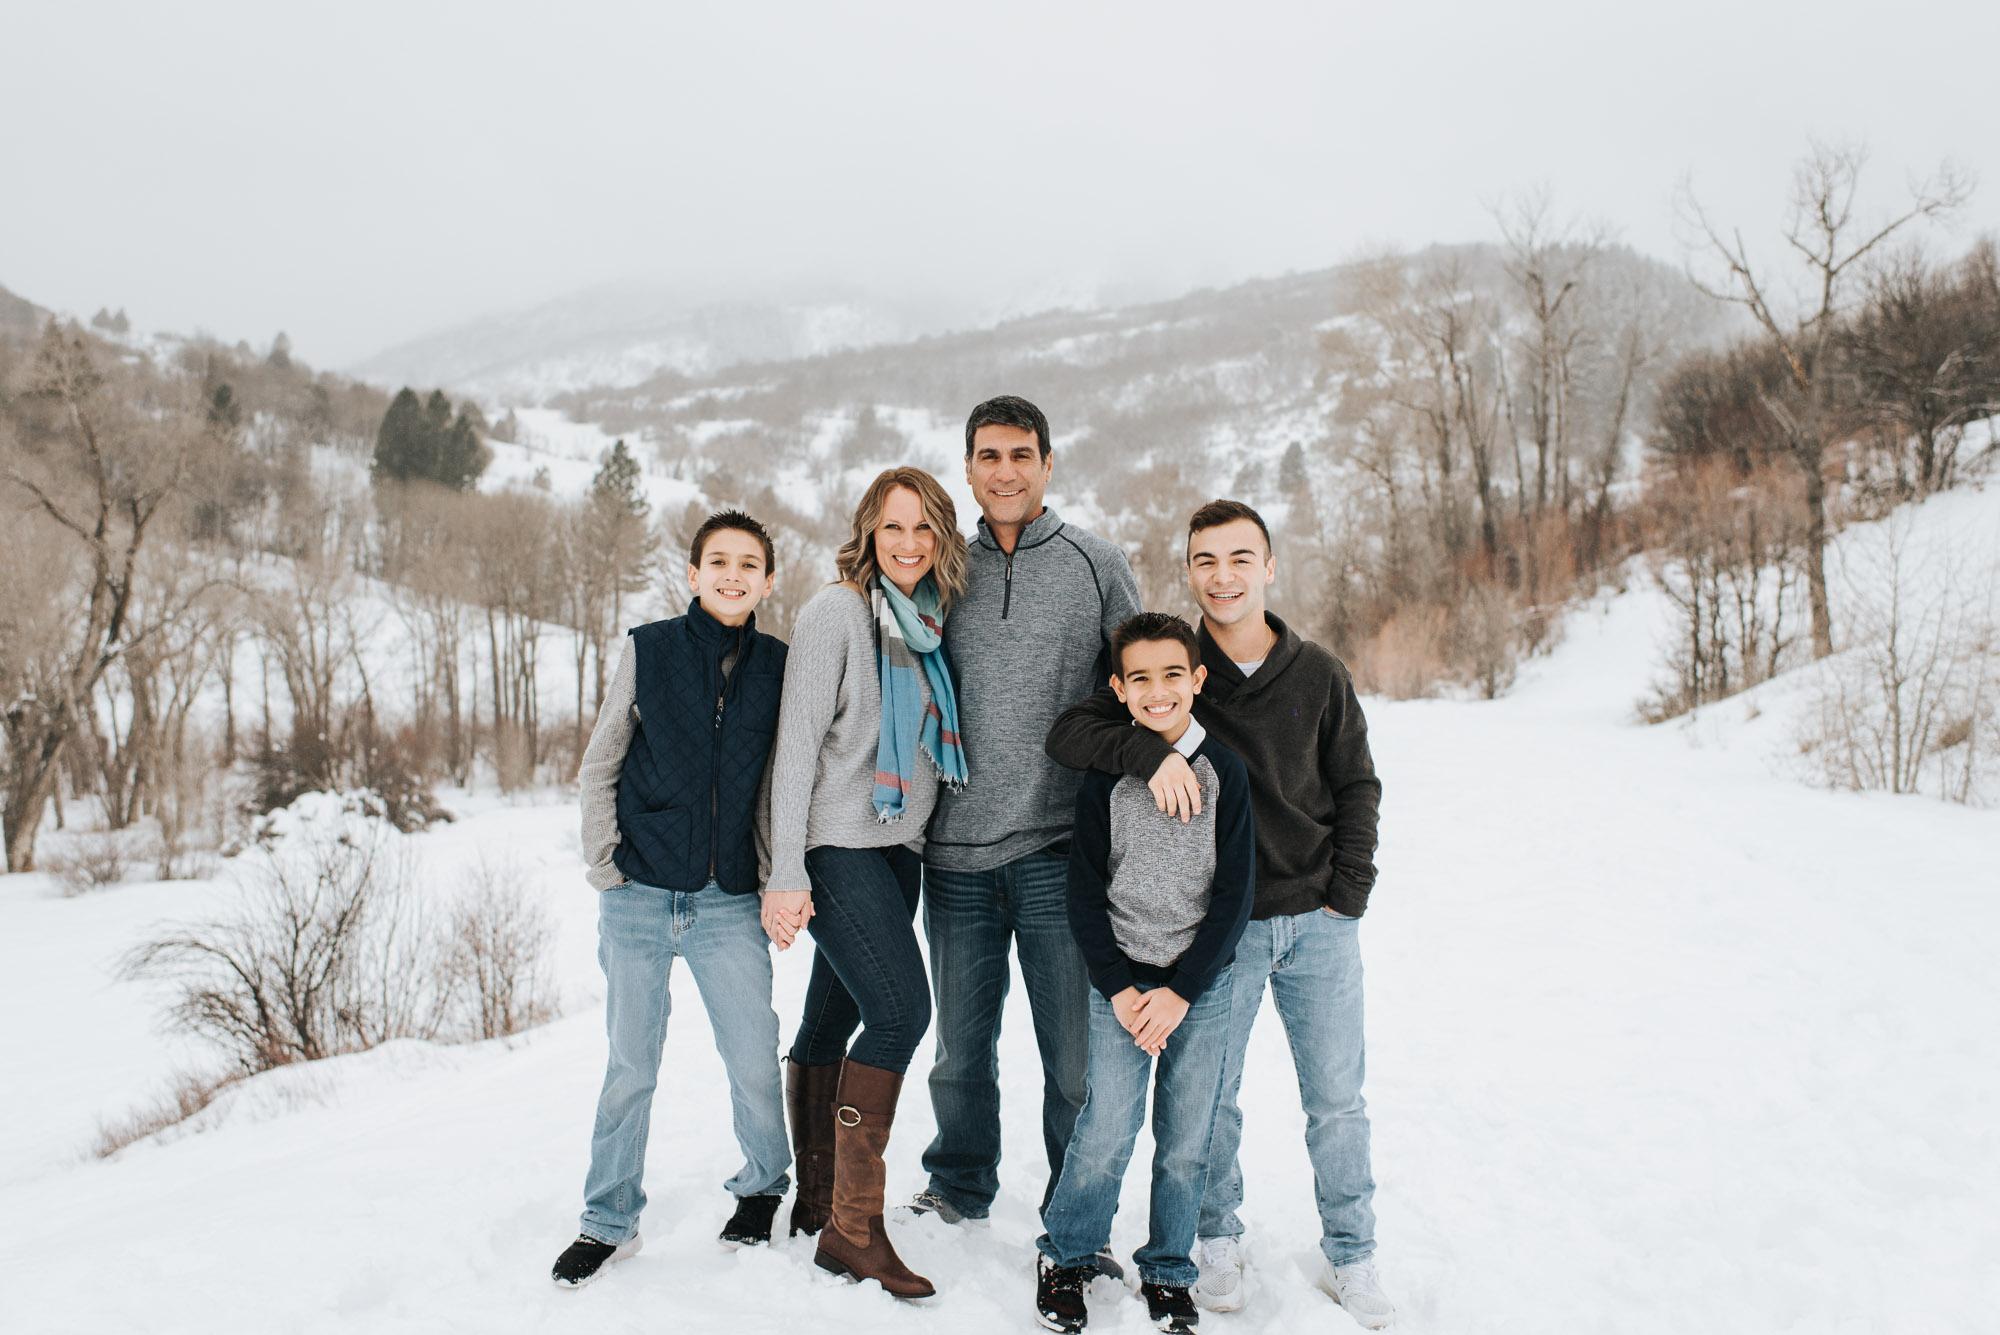 winter_photography_family_cfairchildphotography.jpg